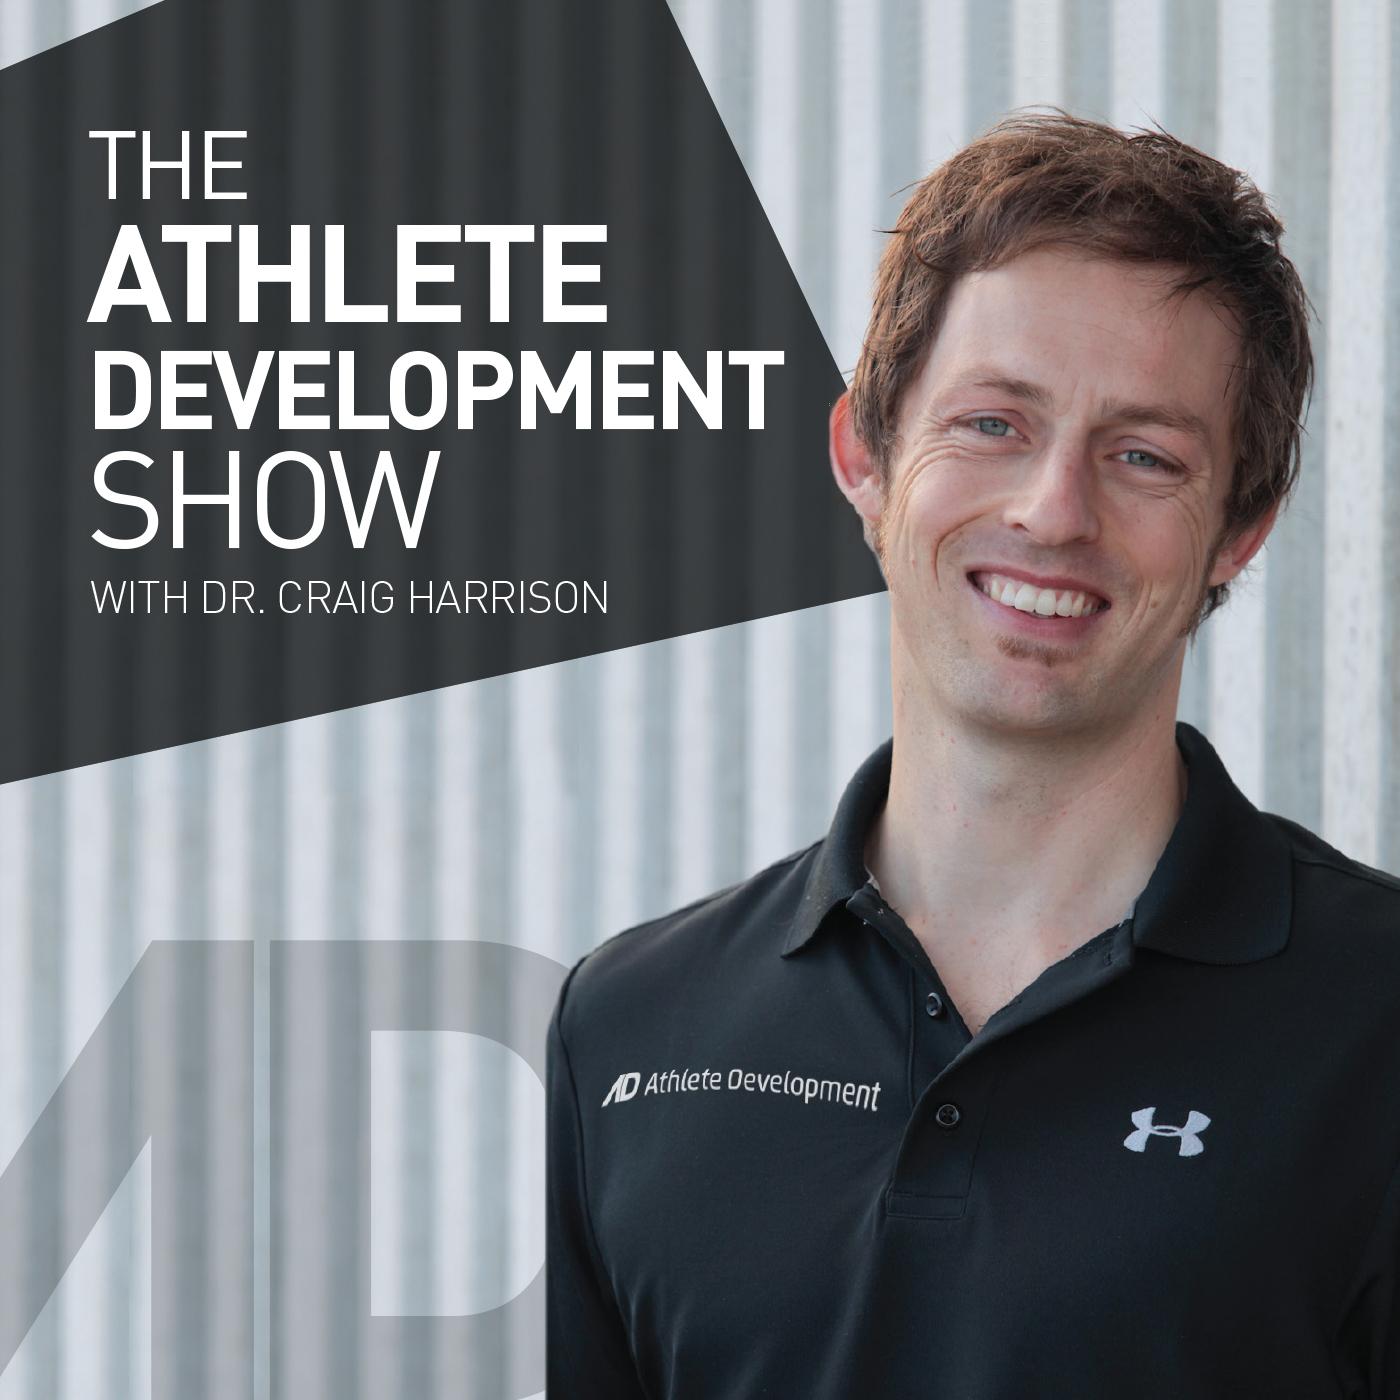 The Athlete Development Show